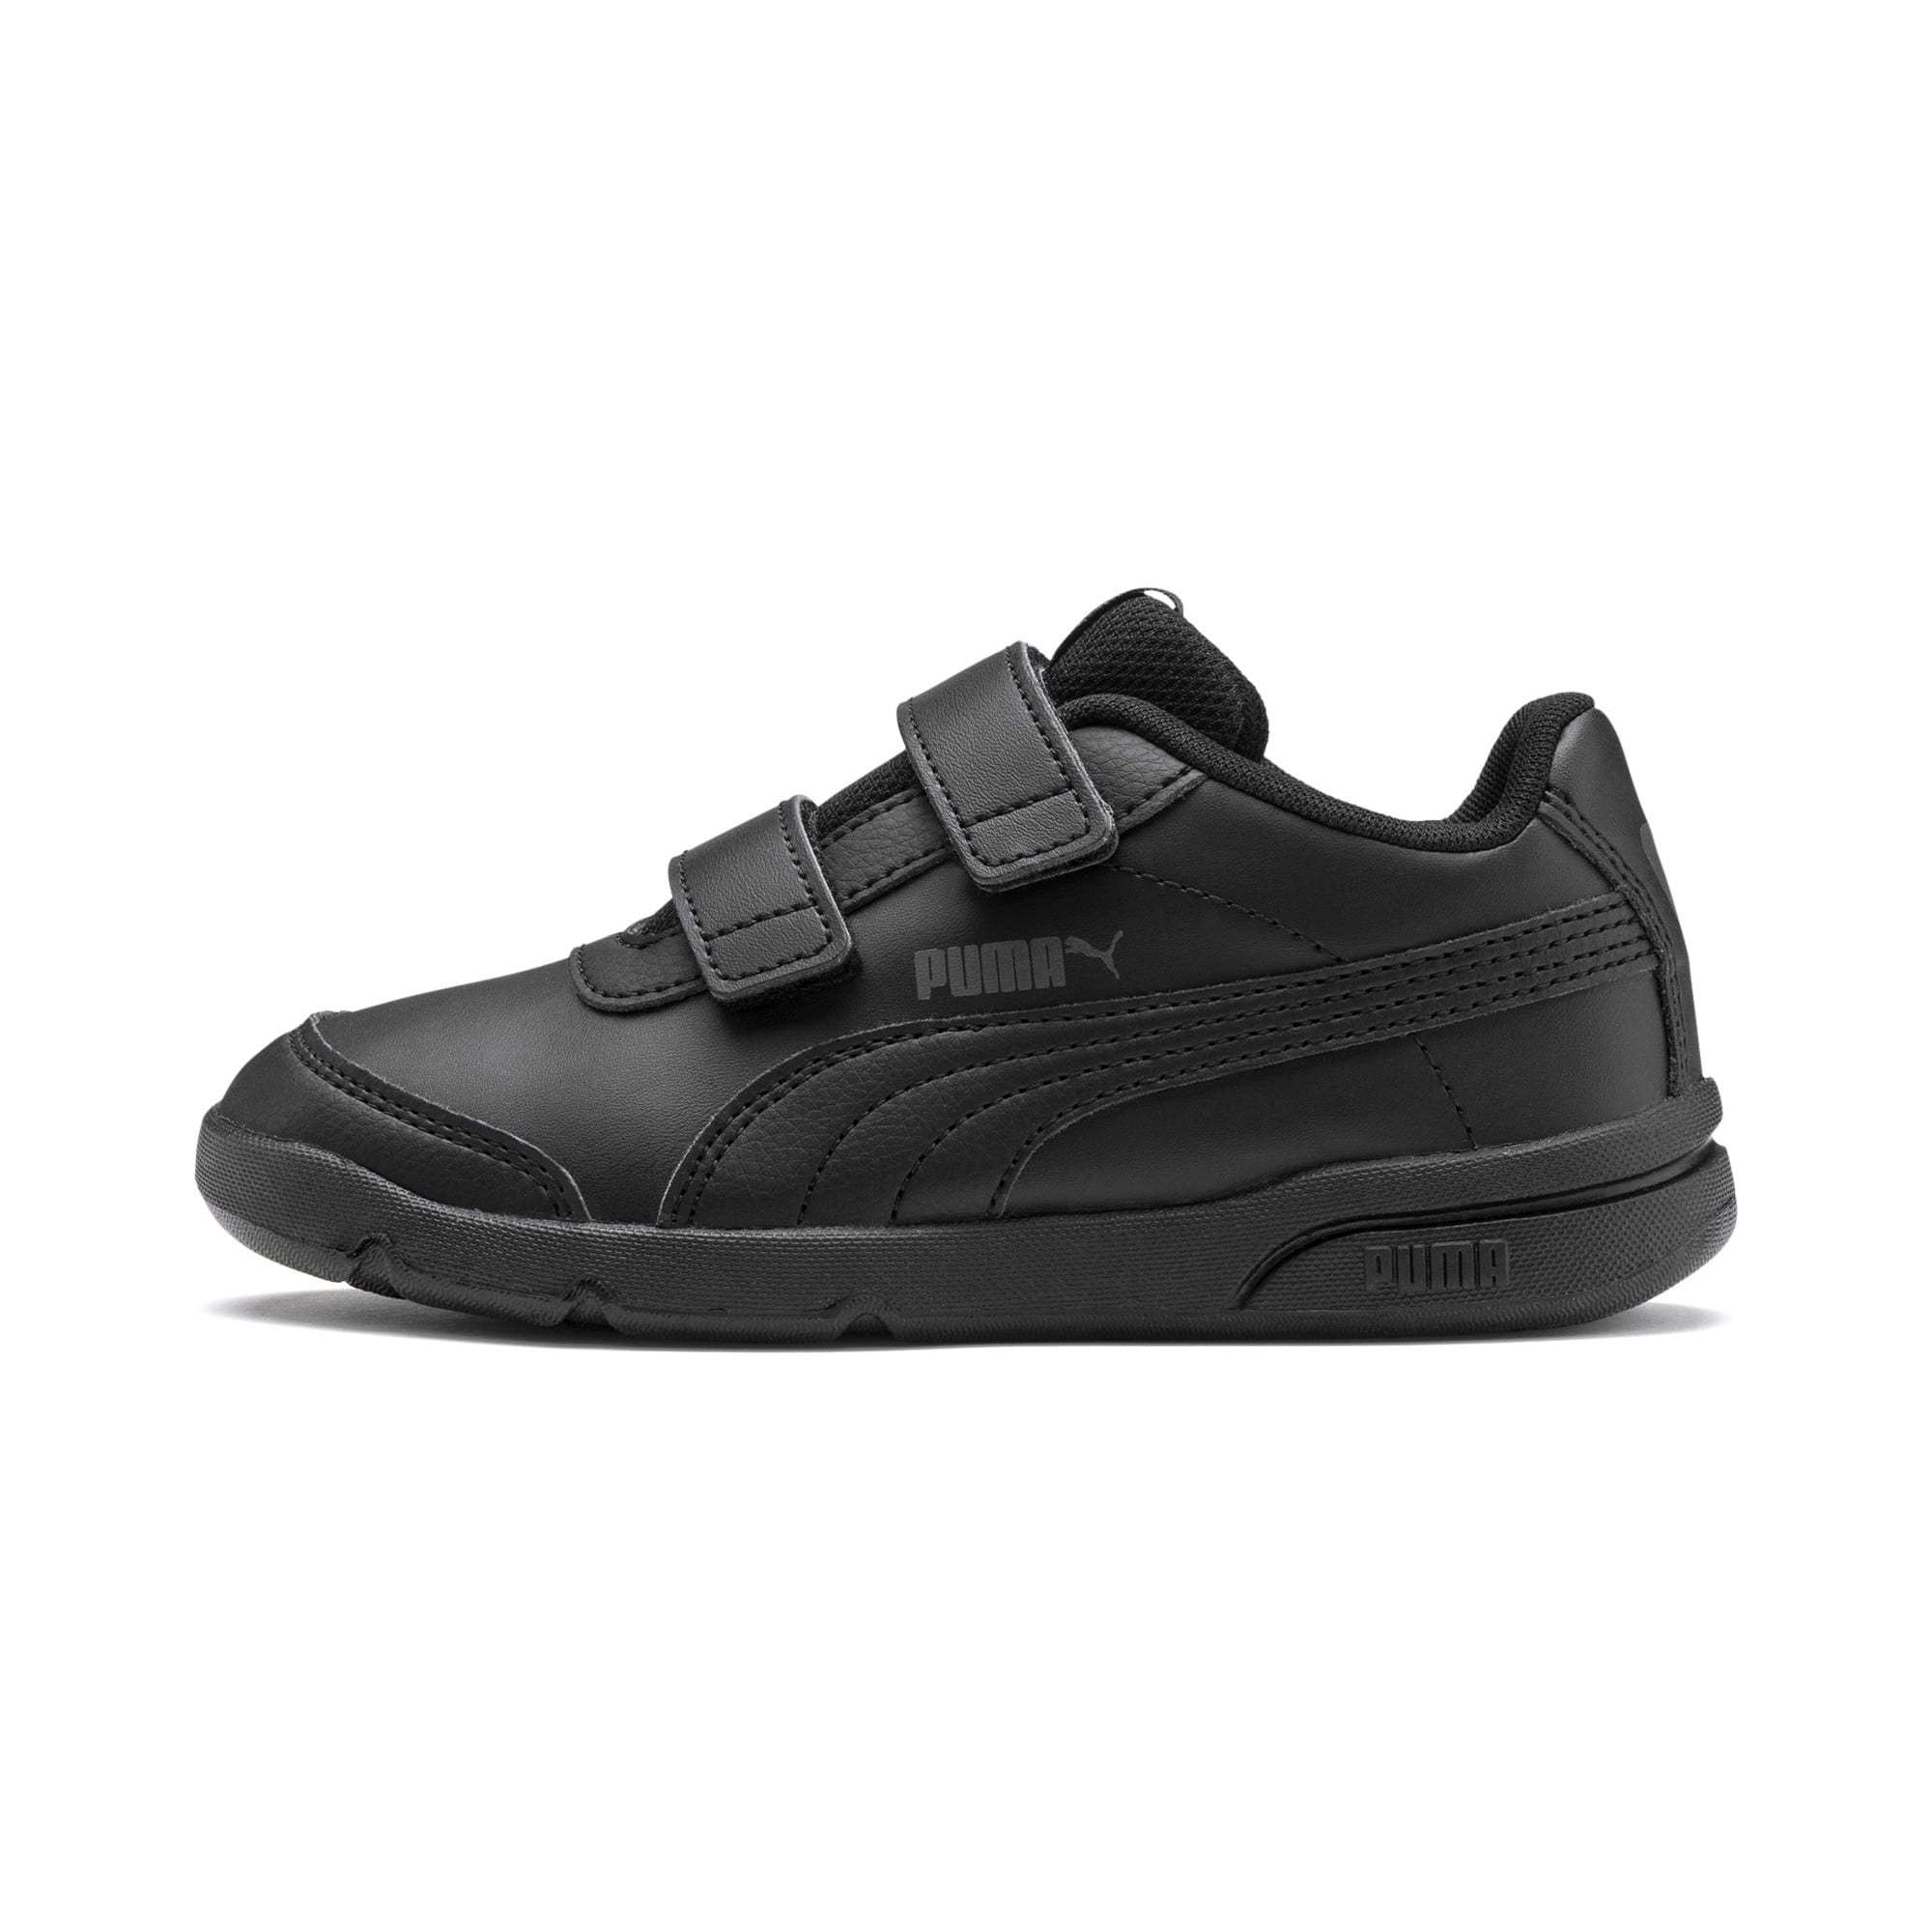 Thumbnail 1 of Stepfleex 2 SL VE V Kids' Trainers, Puma Black-Puma Black, medium